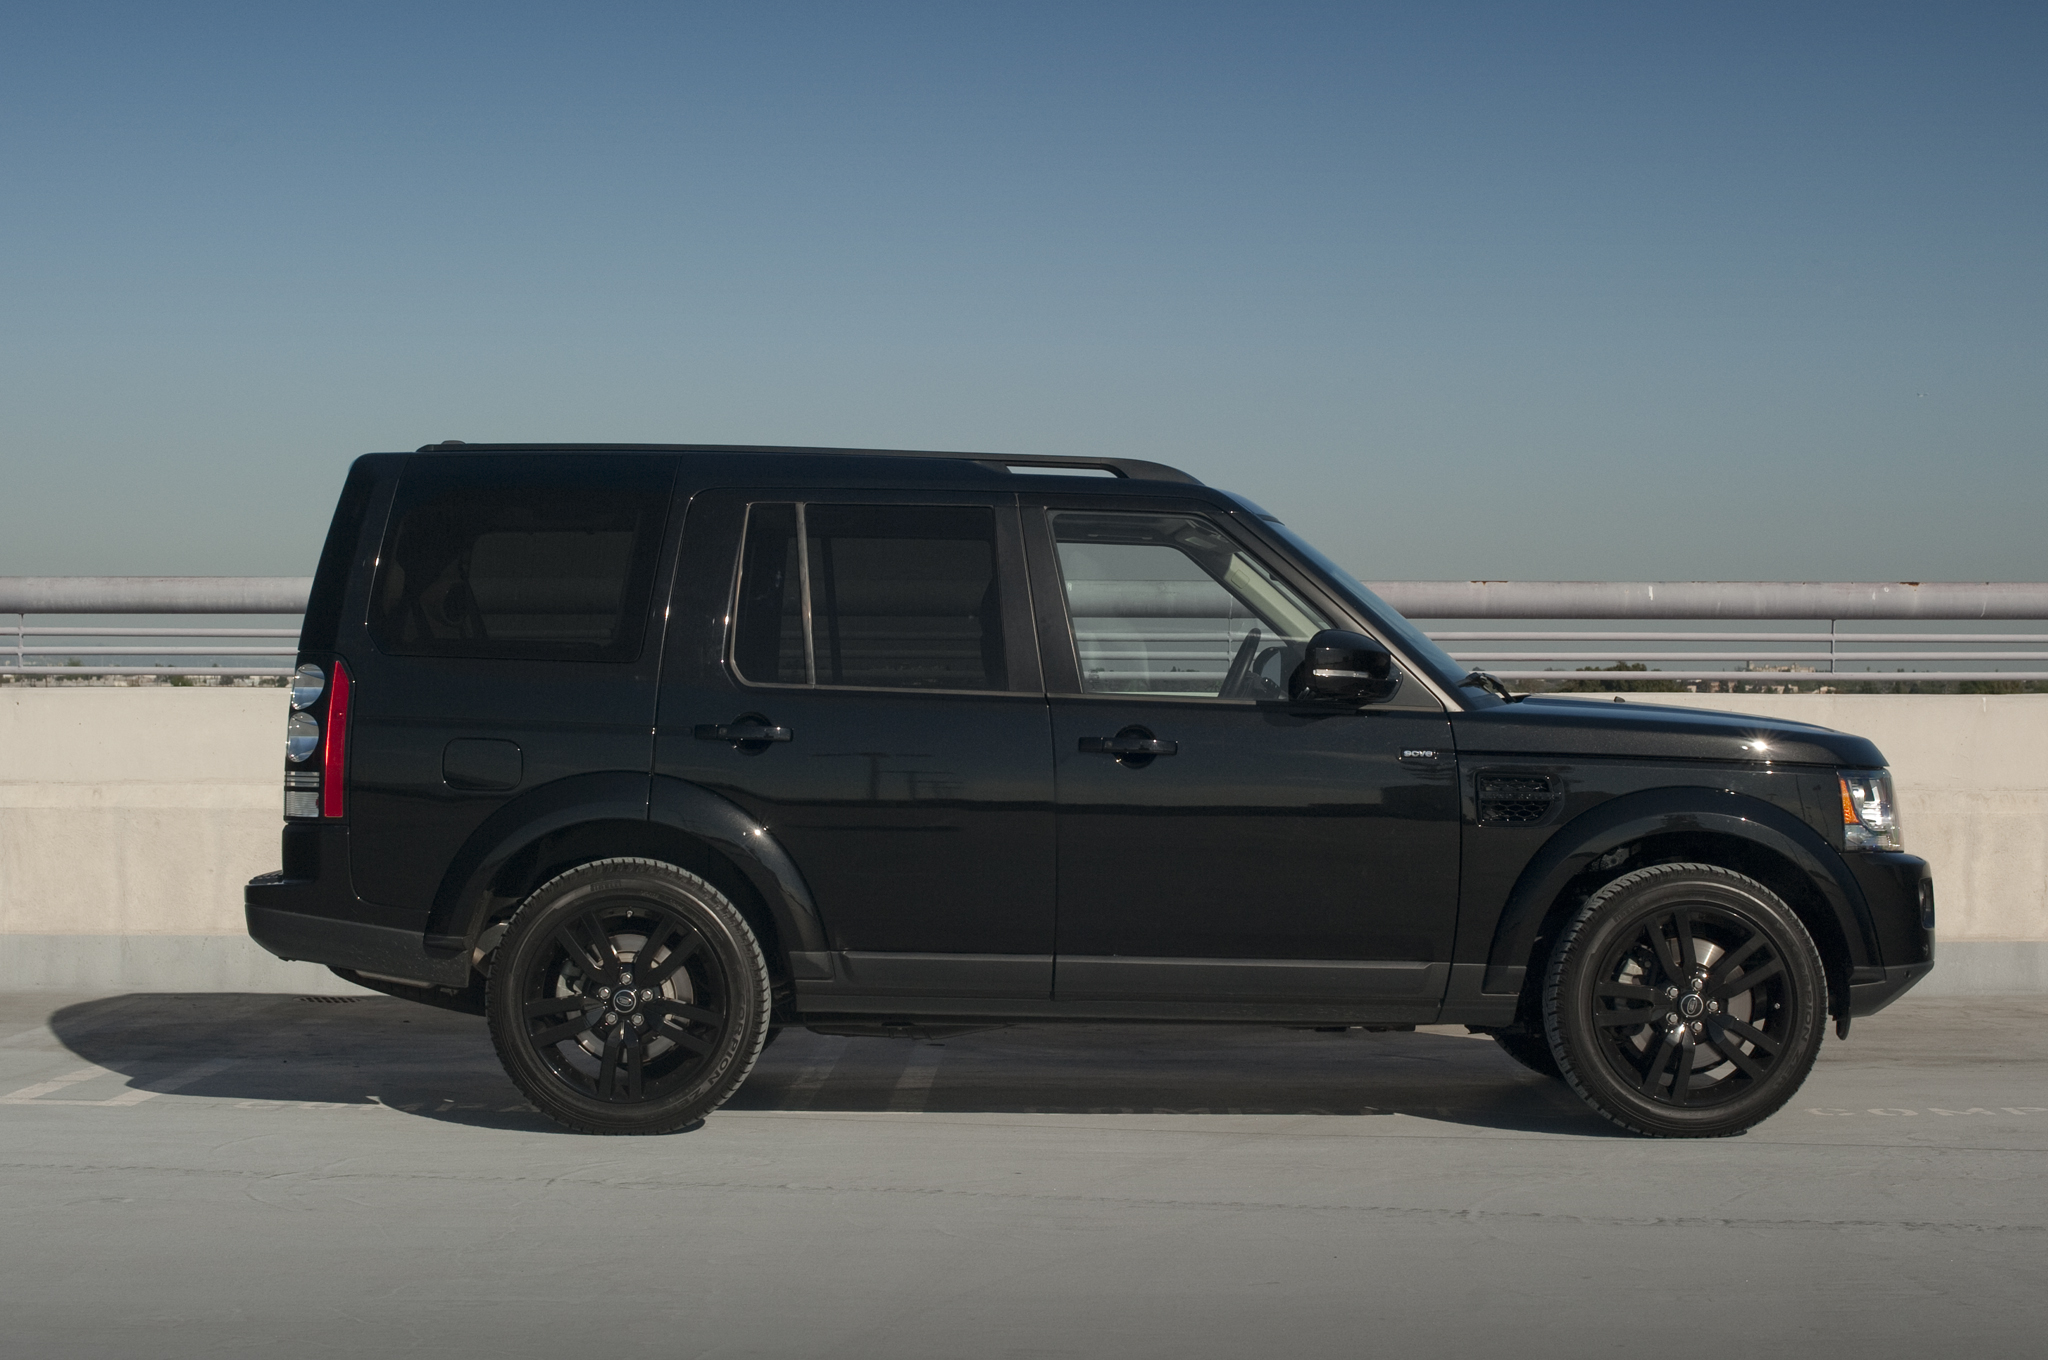 2014 Land Rover Lr4 Image 11